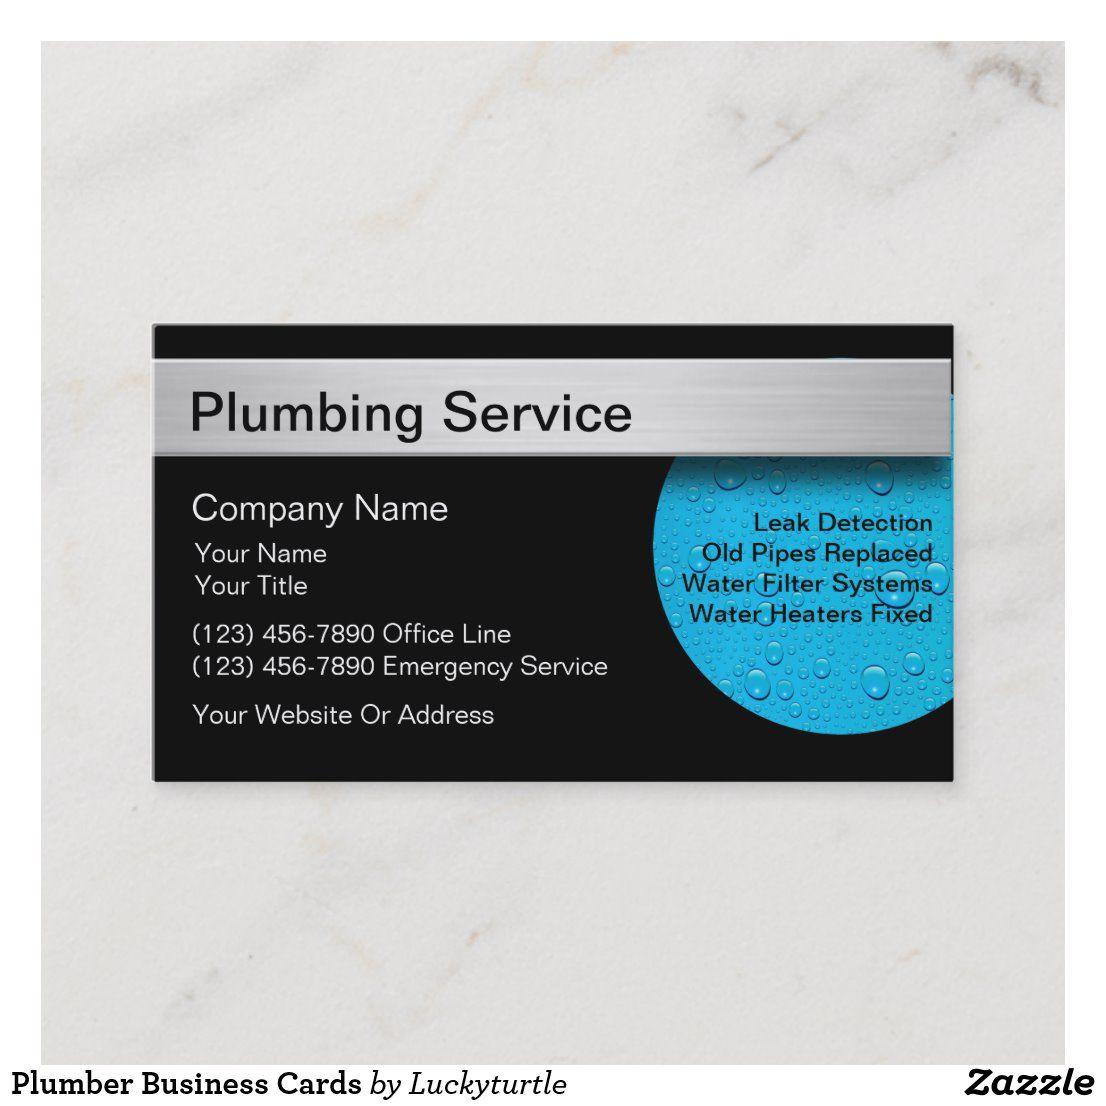 Plumber Business Cards Zazzle Com Plumber Business Cards Modern Business Cards Design